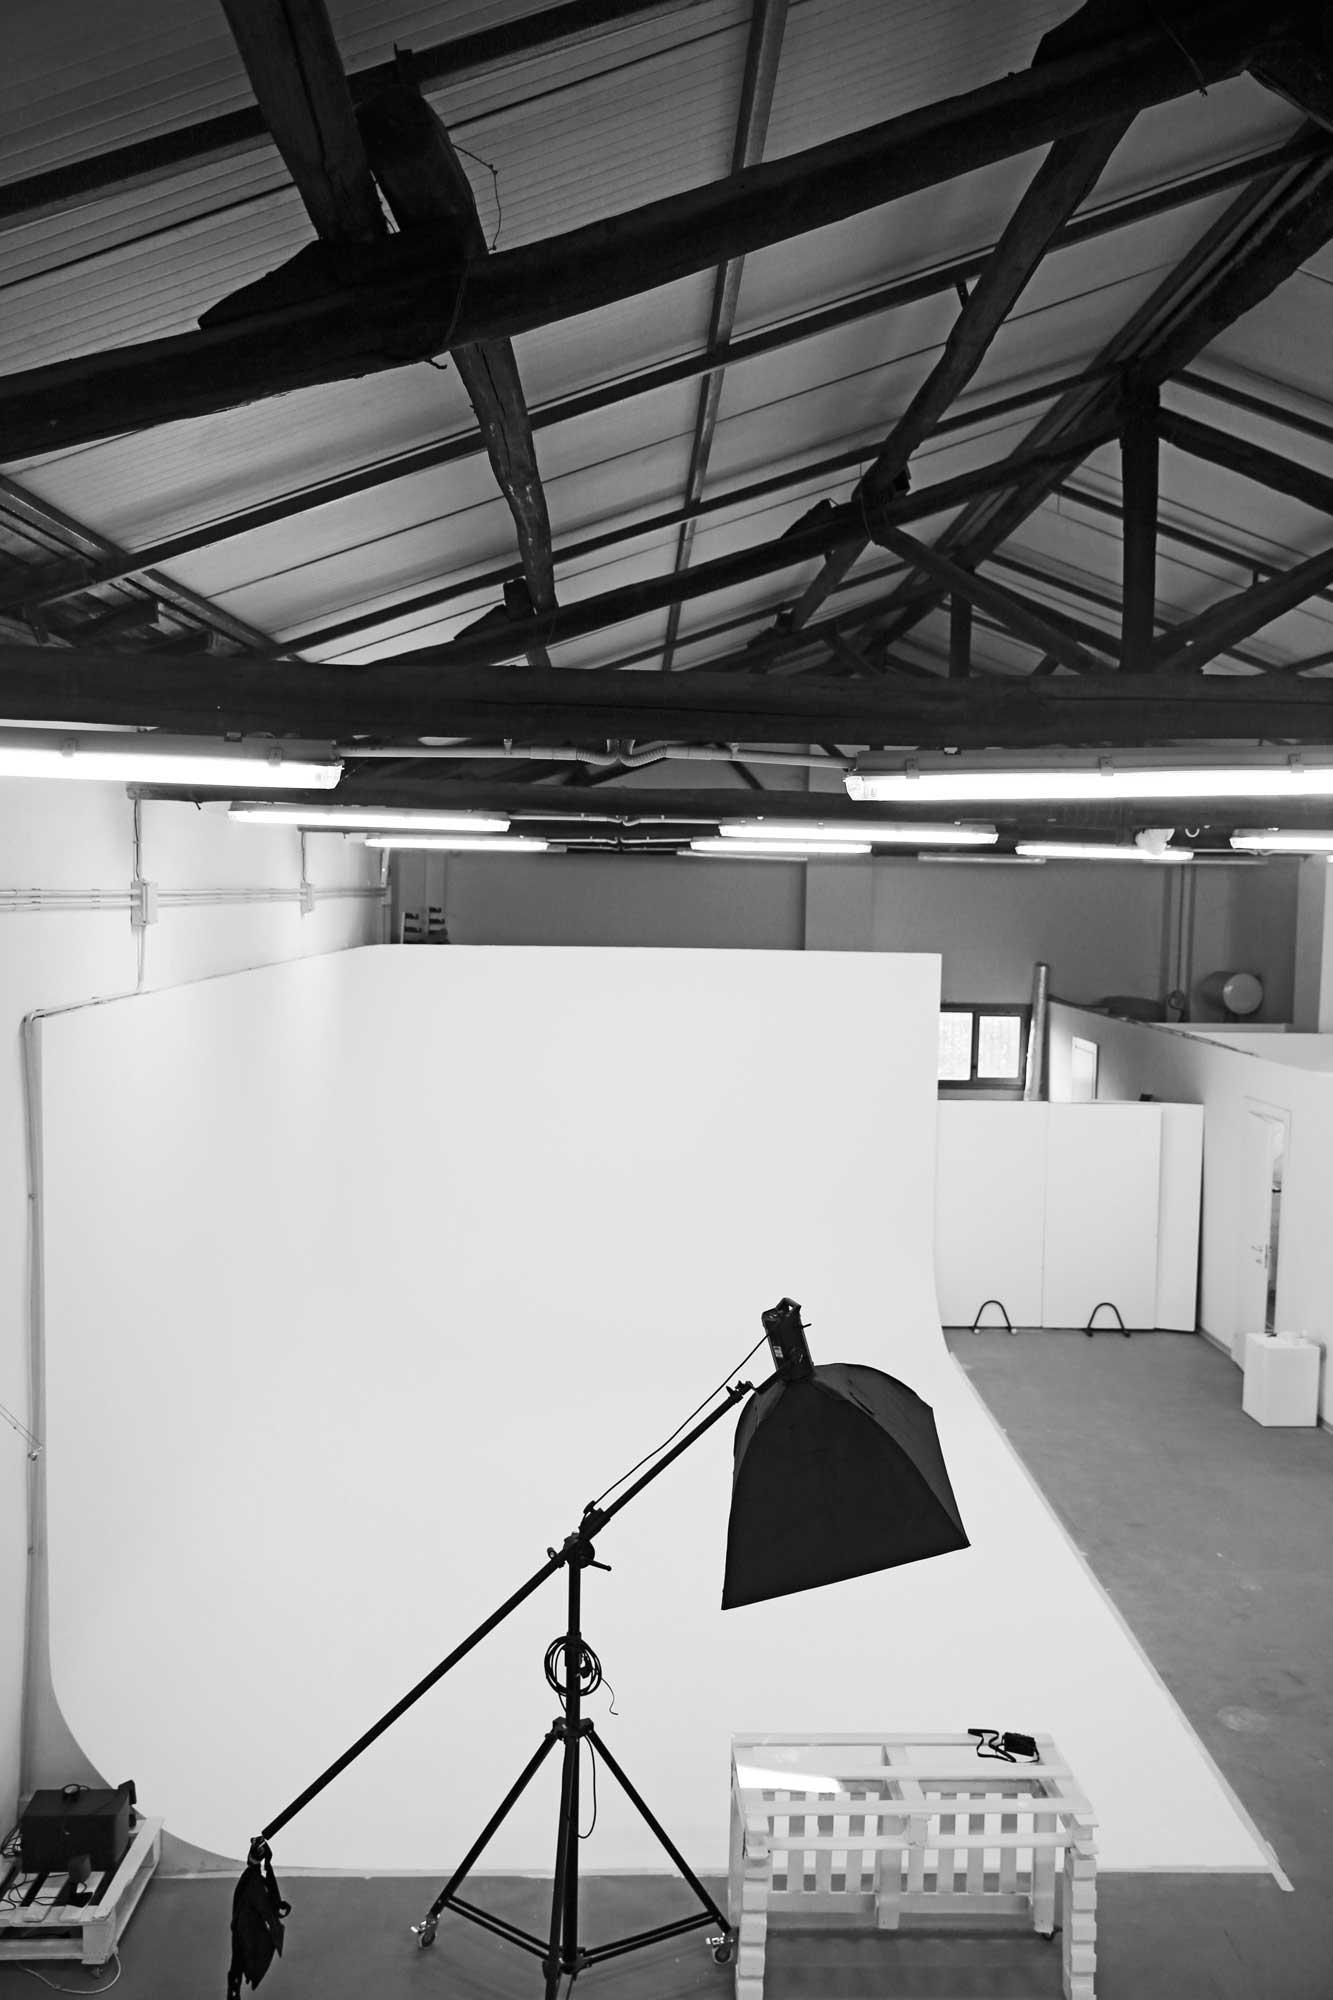 noleggio limbo cyclorama roma sala posa studio fotografico10